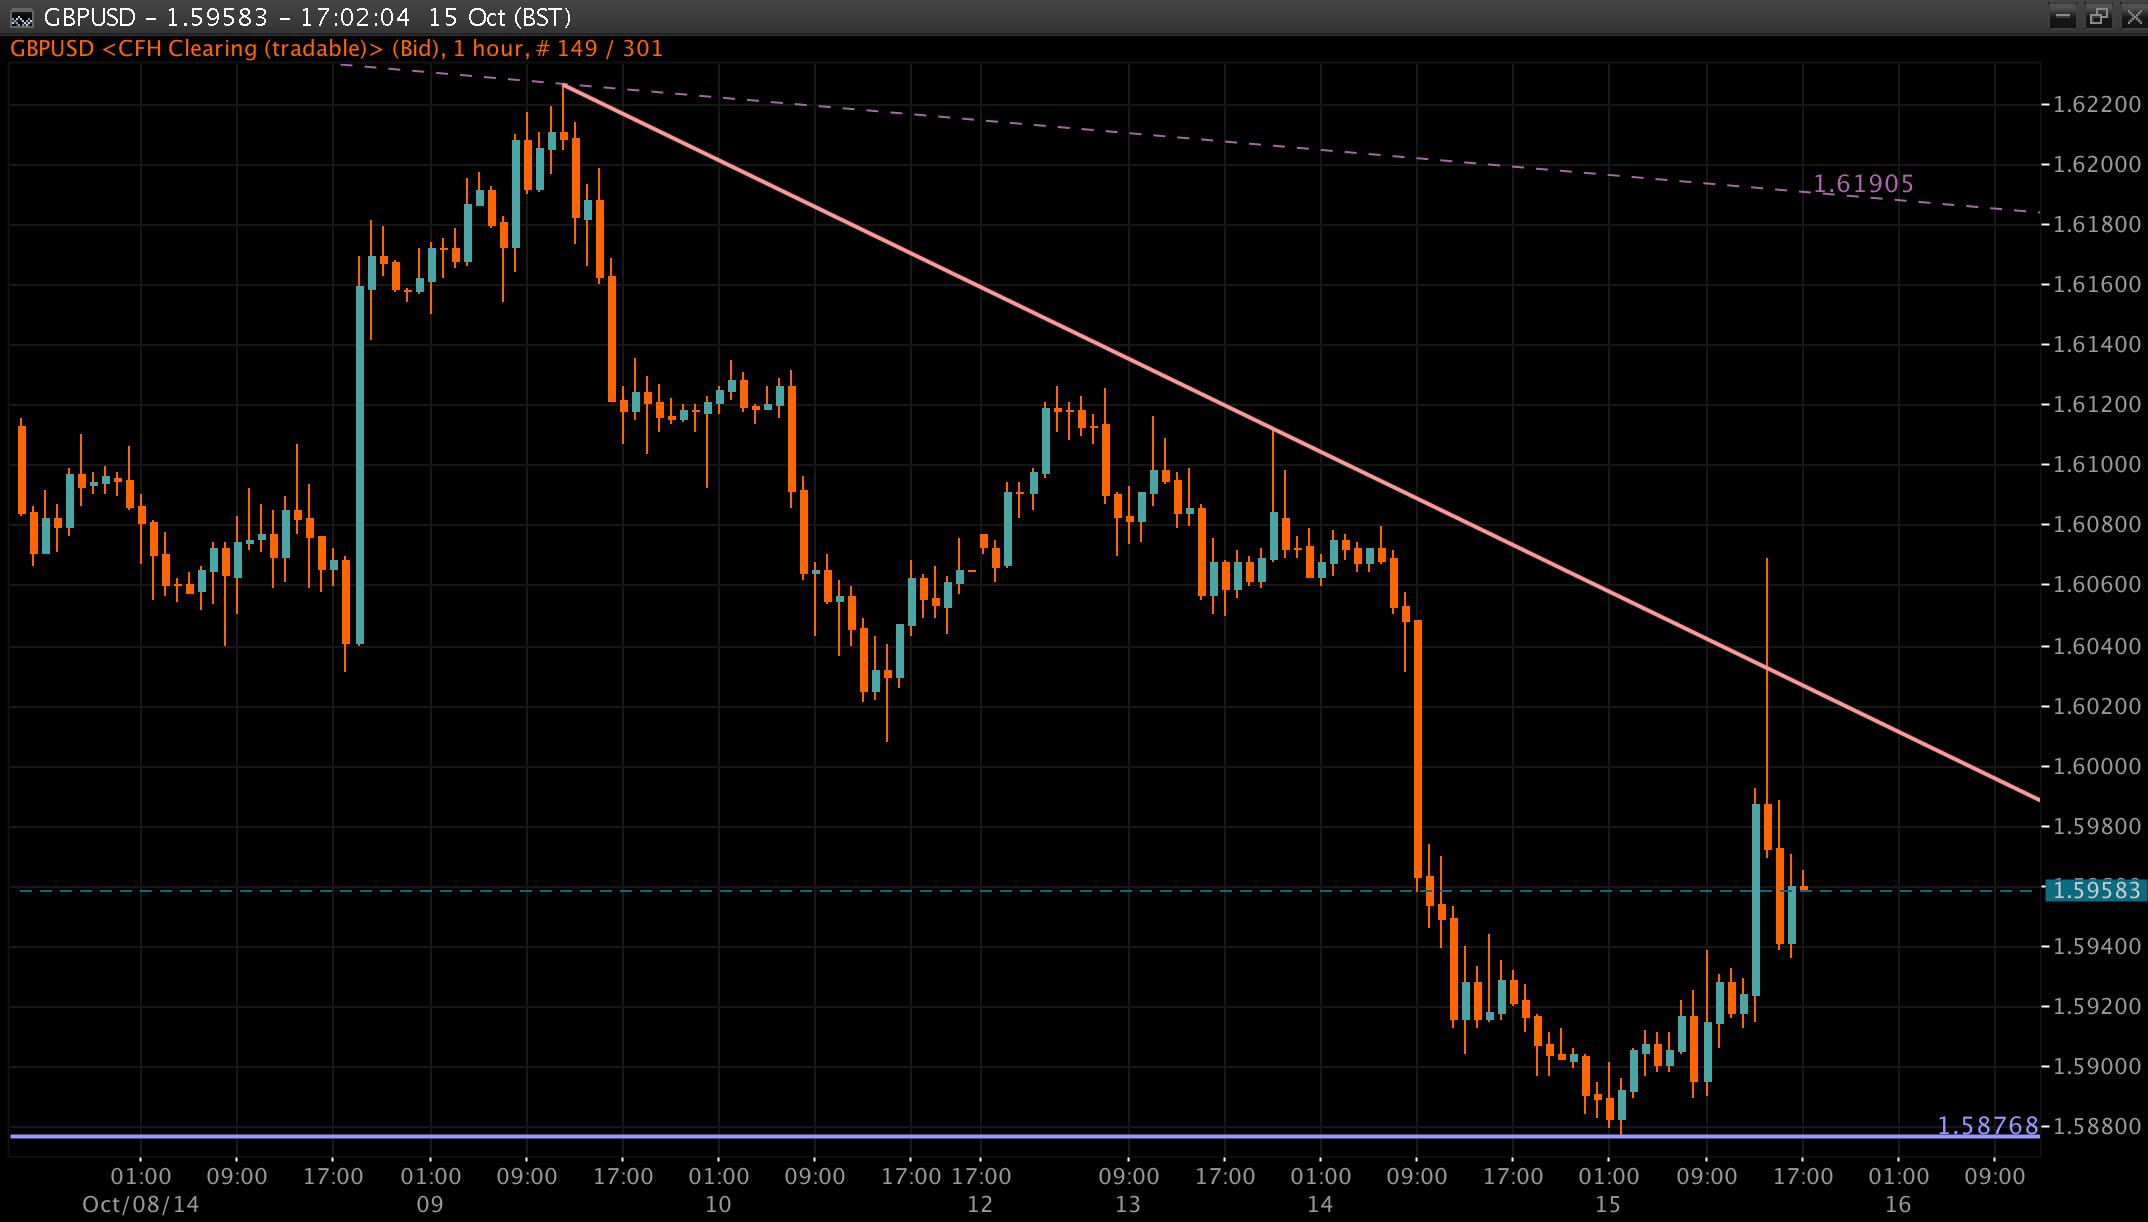 GBP/USD Chart 16 Oct 2014